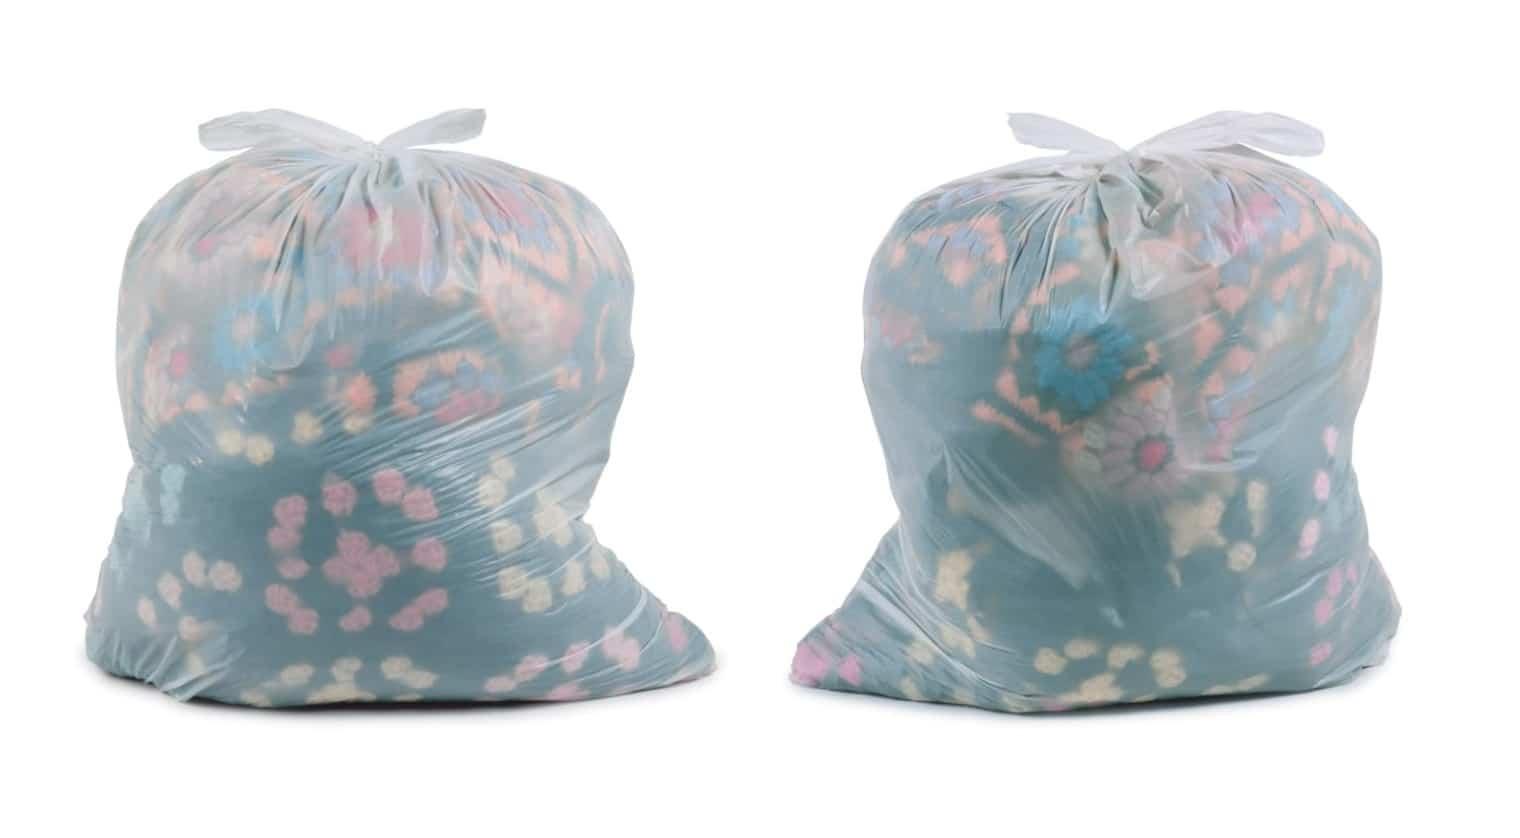 "CHUCK RAMIREZ AMERICAN, 1962-2010 TRASH BAGS: AFGHANS, 1998 Pigment inkjet print 48 x 60"""